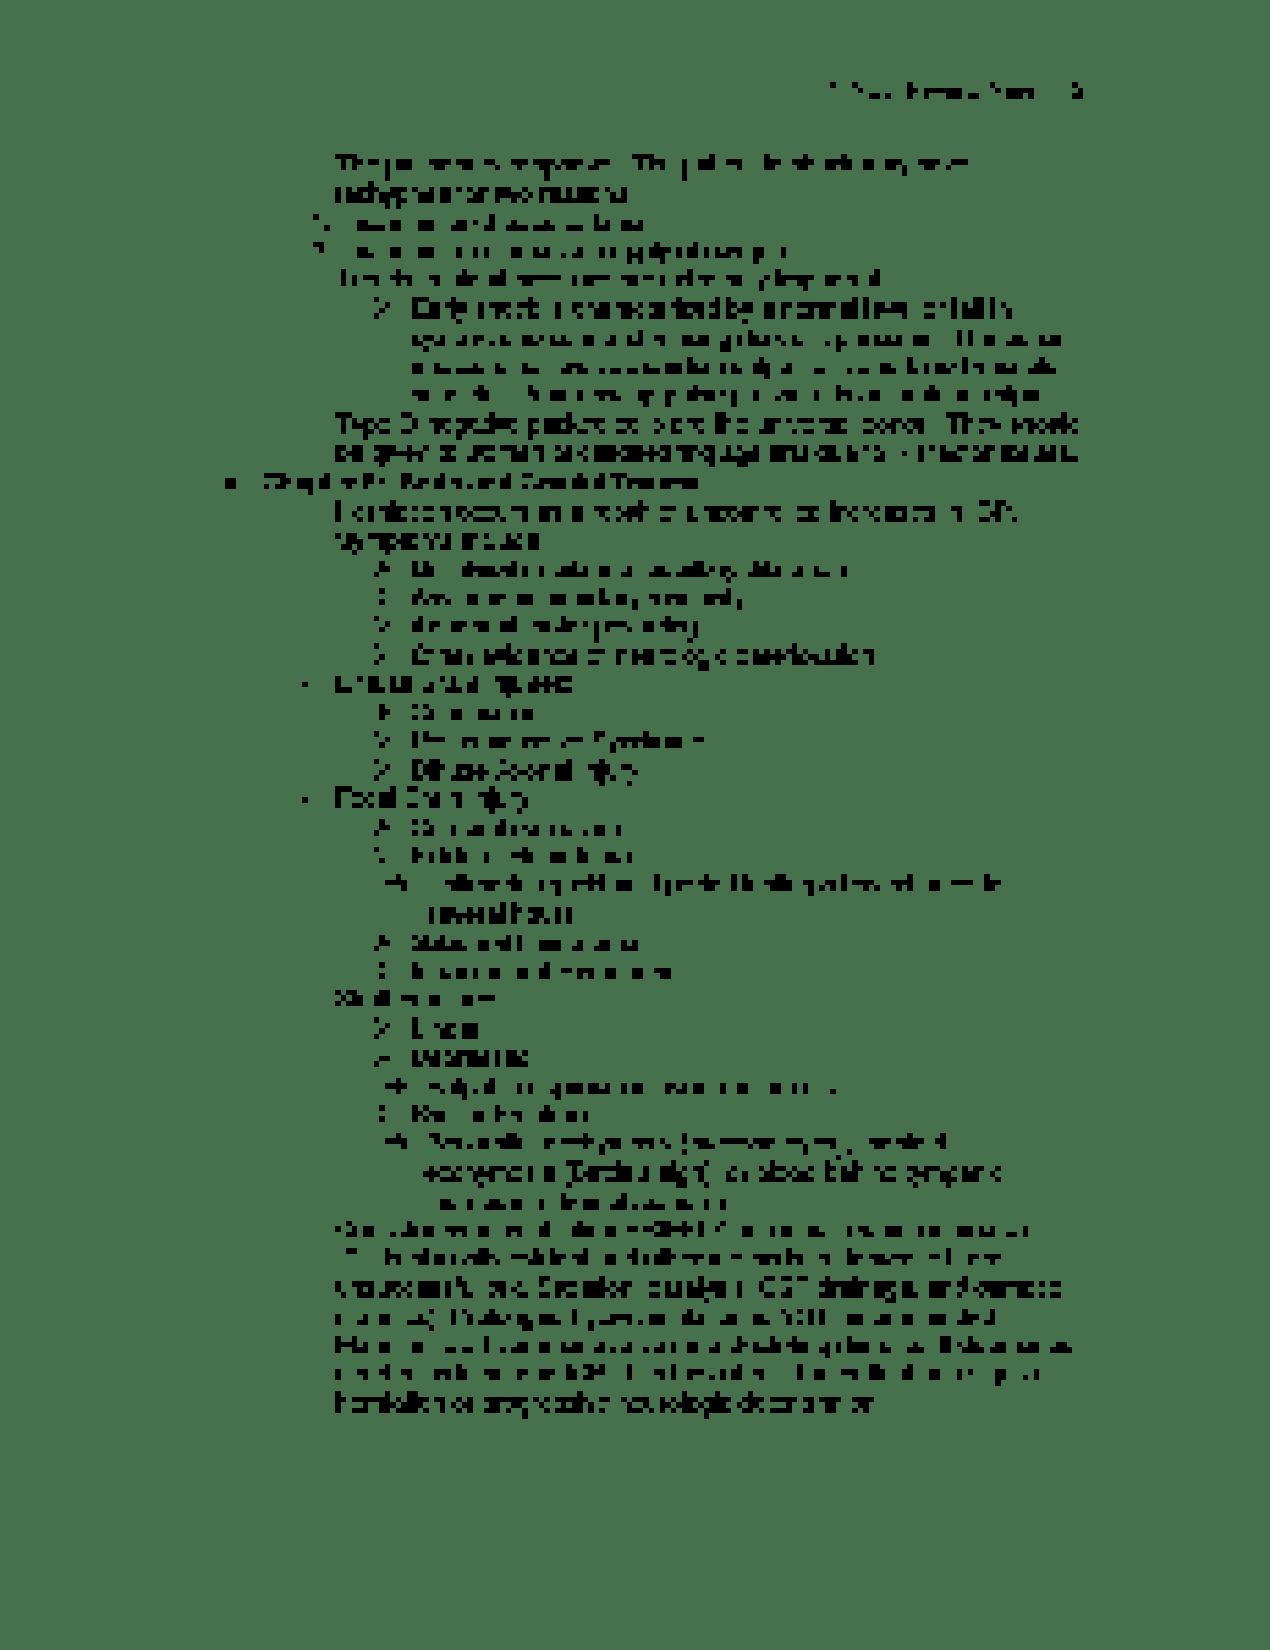 SOLUTION: TNCC Trauma Nurse Core Course Study Guide